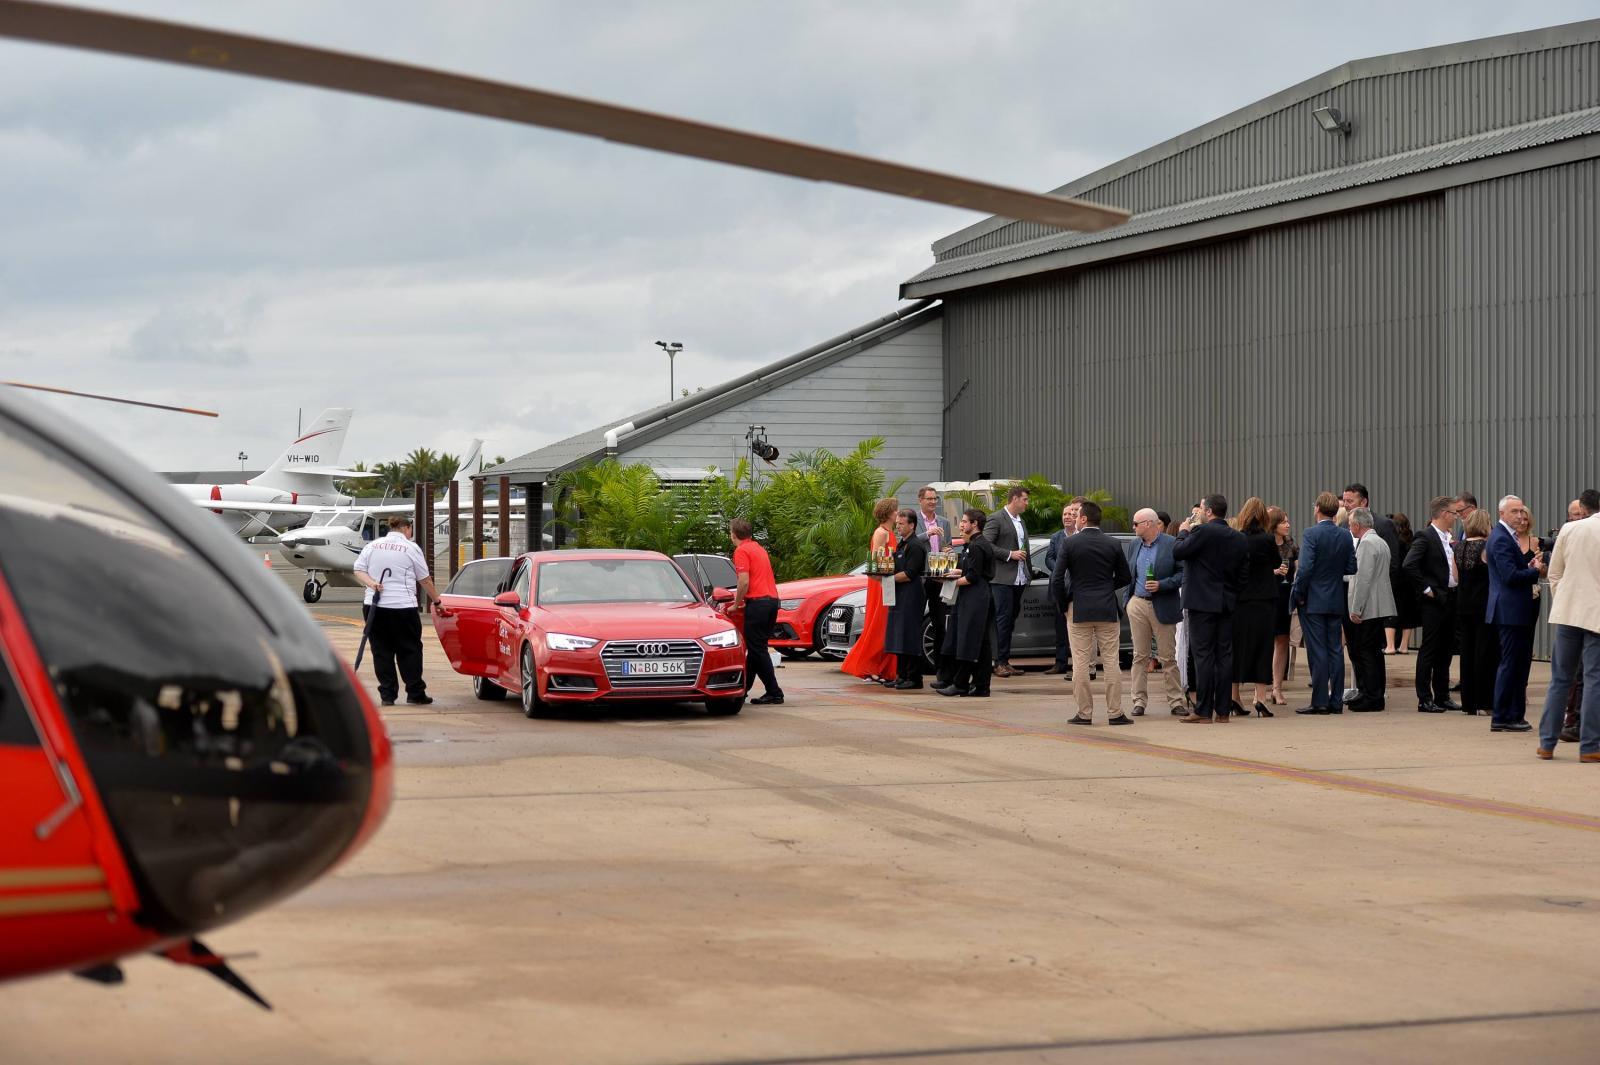 AHIRW 2016 Audi Hosted secret dinner @ the hanger - arrivals - photo- Ken Butti(0014)